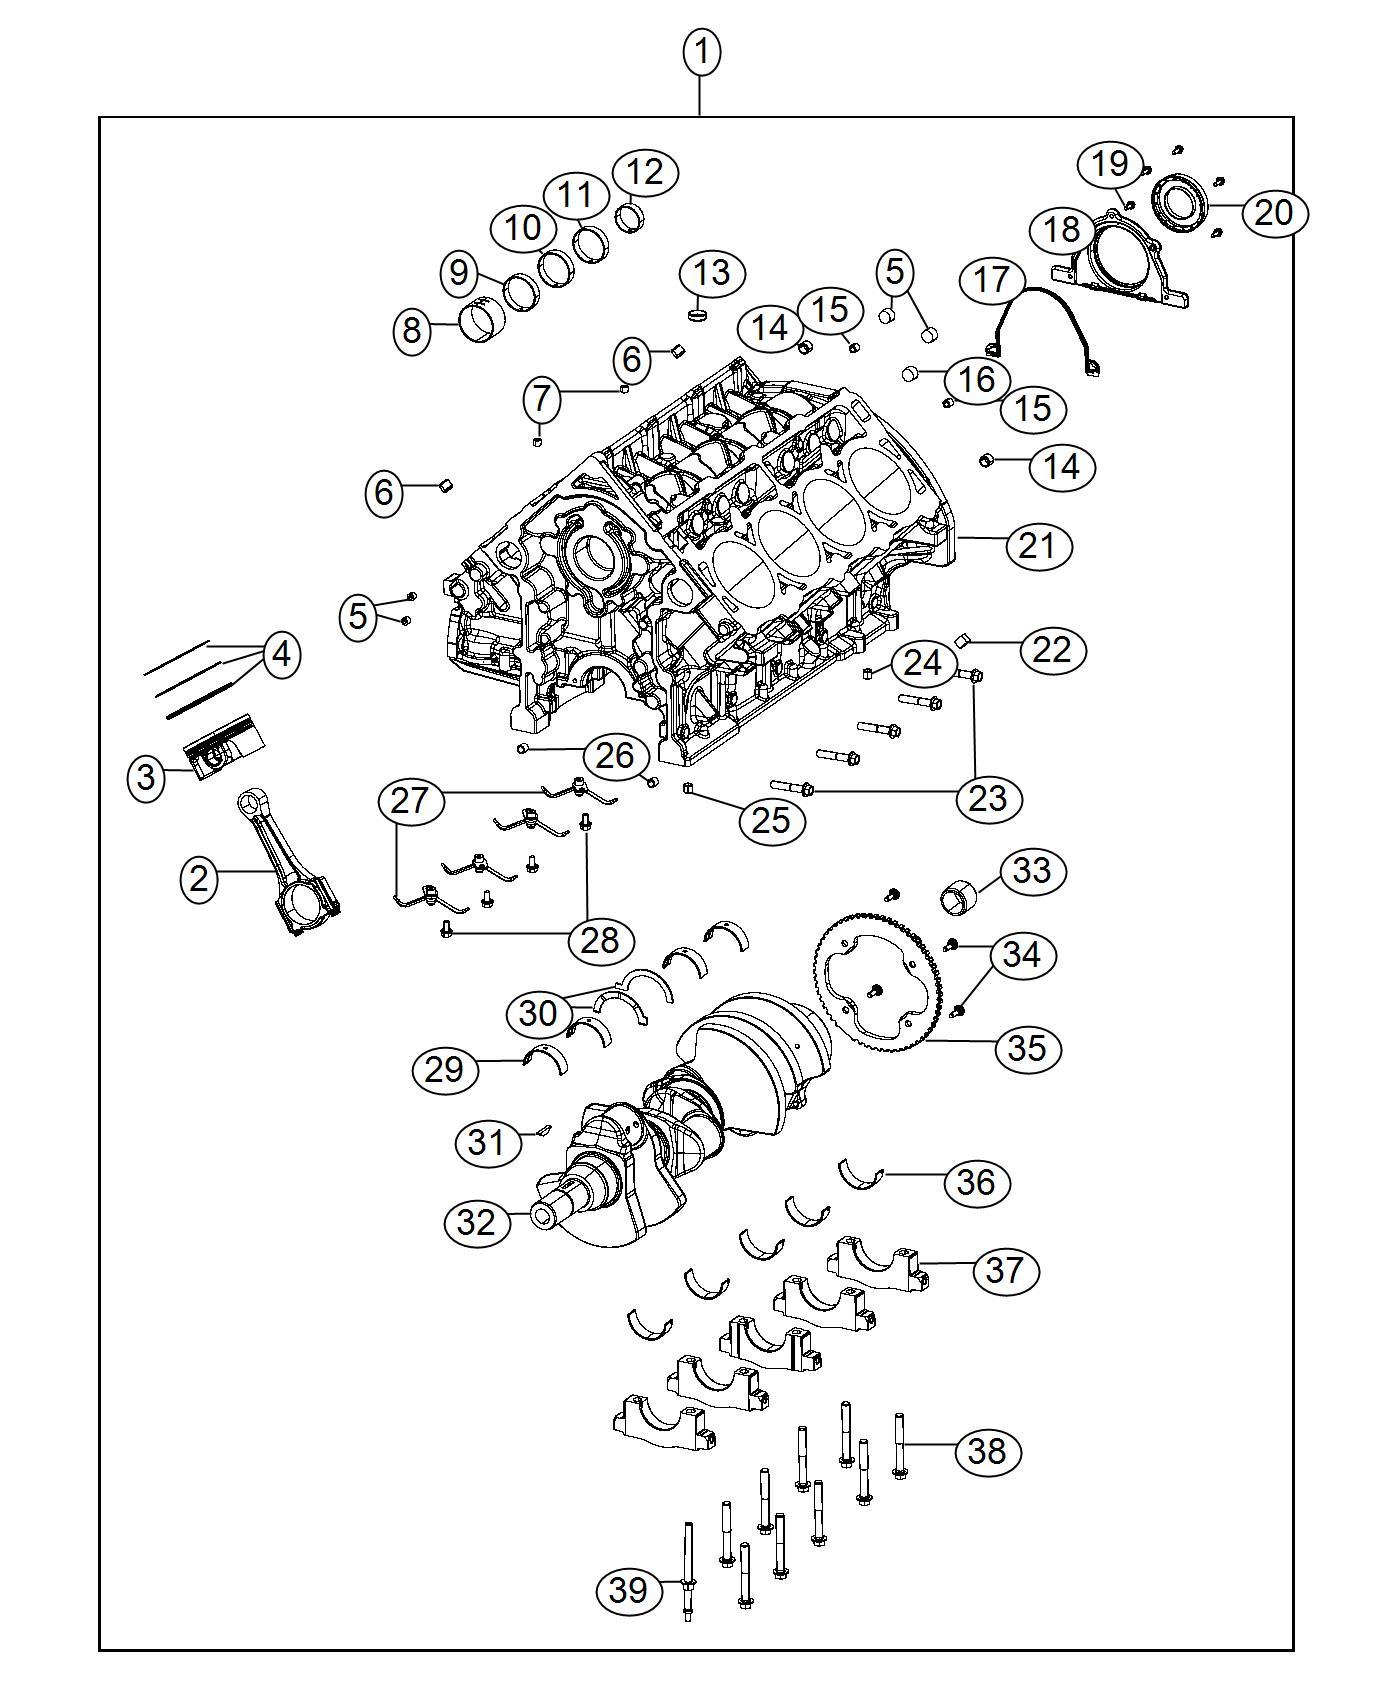 2017 Jeep Grand Cherokee Jet. Piston oil cooler. Engine